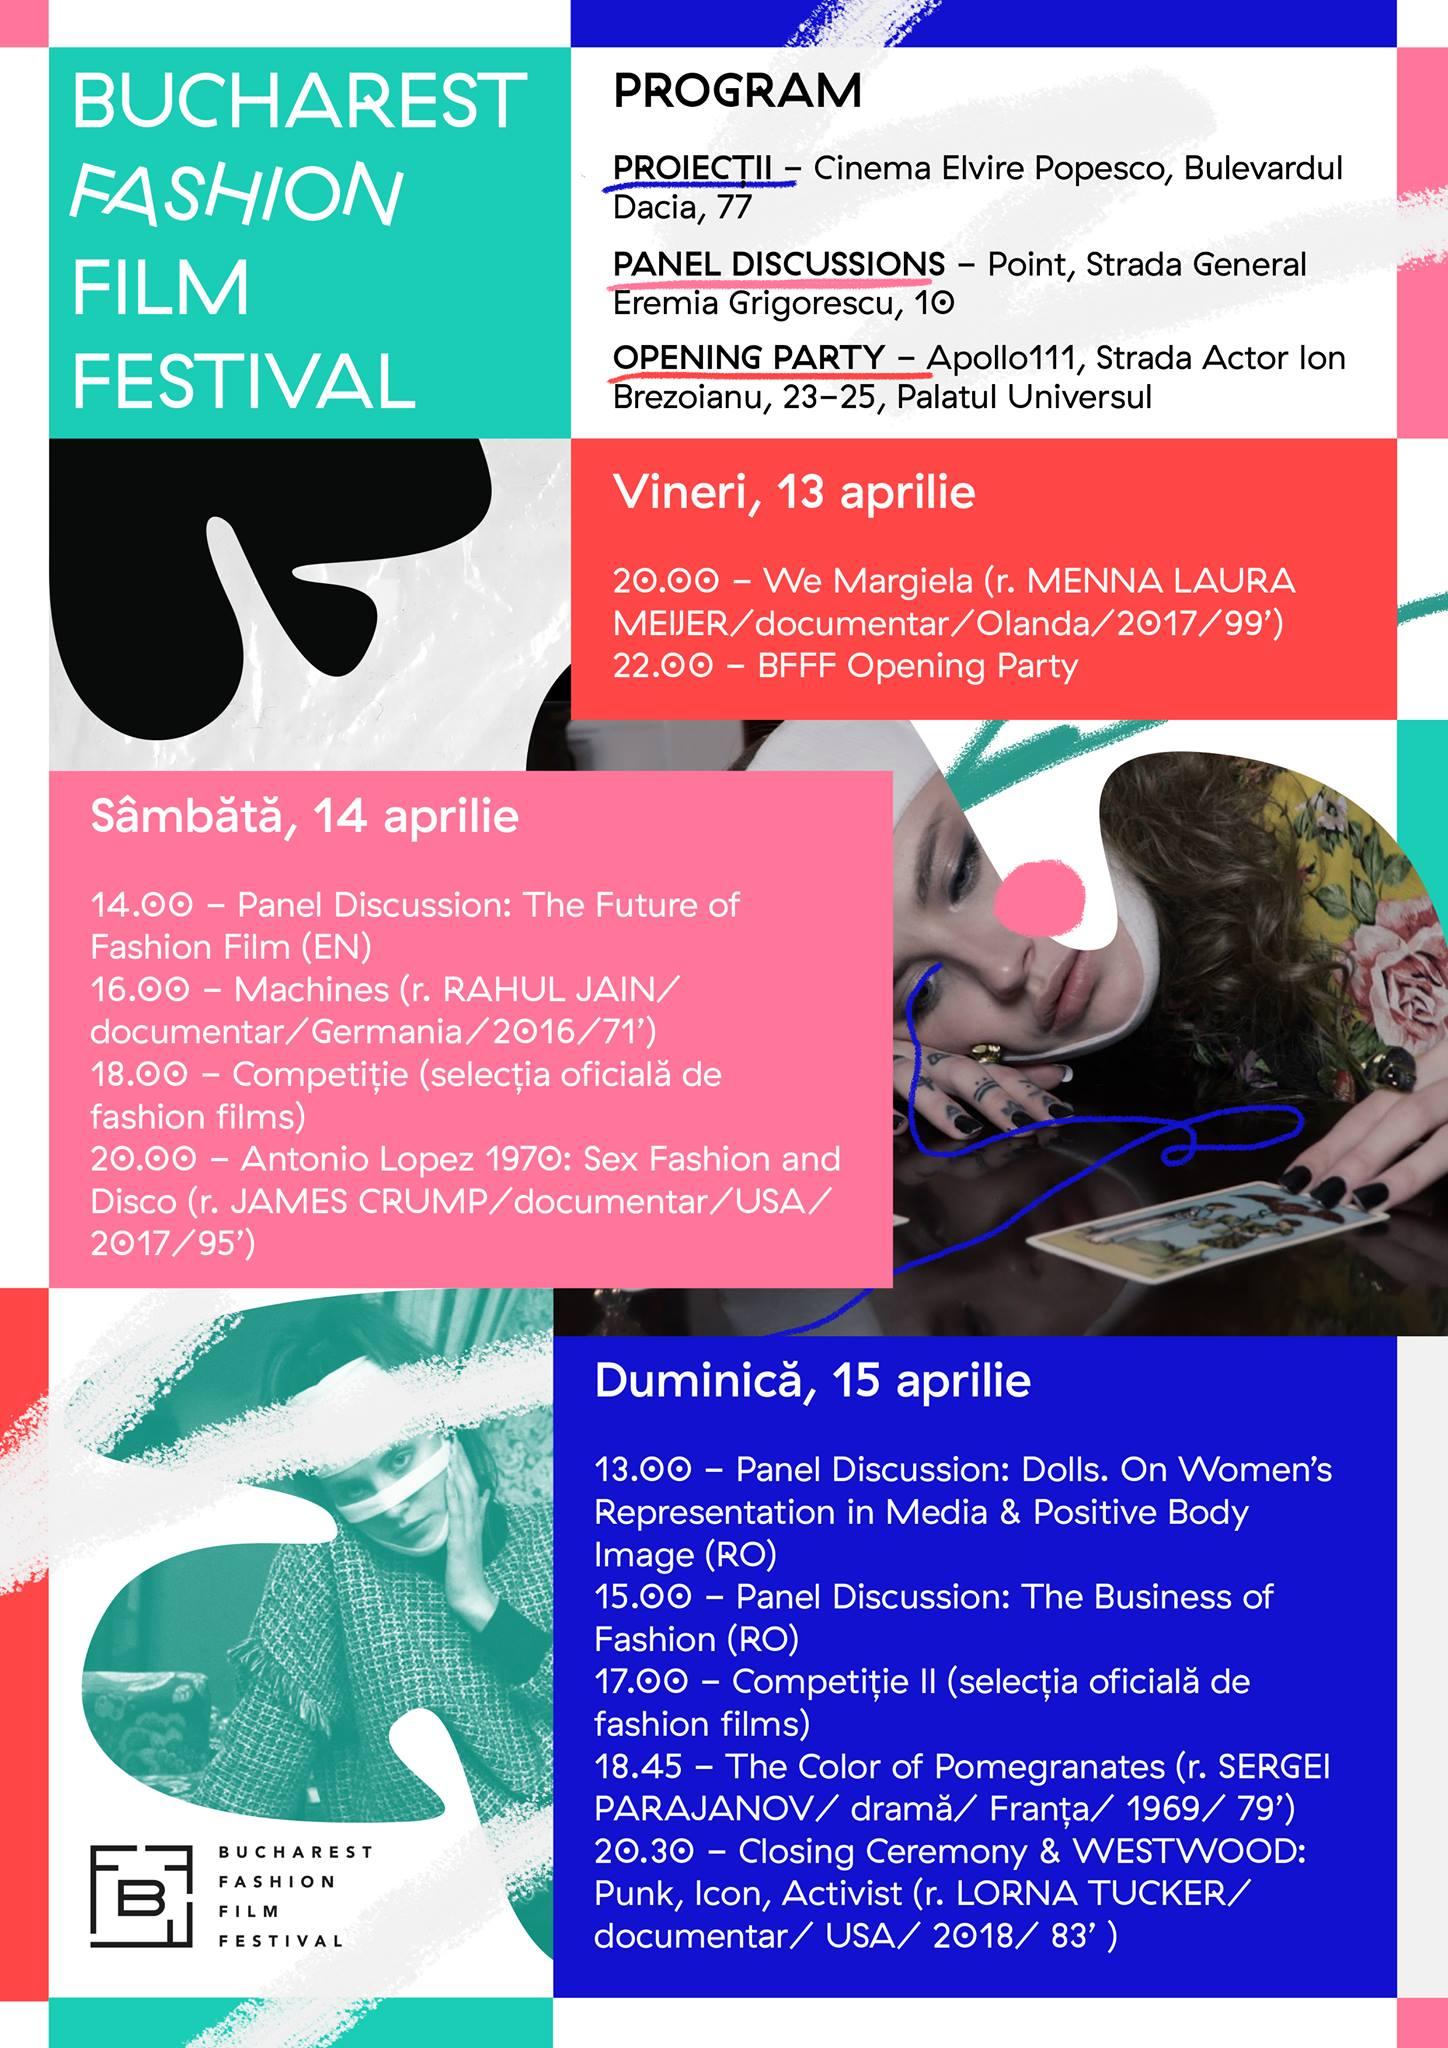 Program_Bucharest_Fashion_Film_Festival.jpg